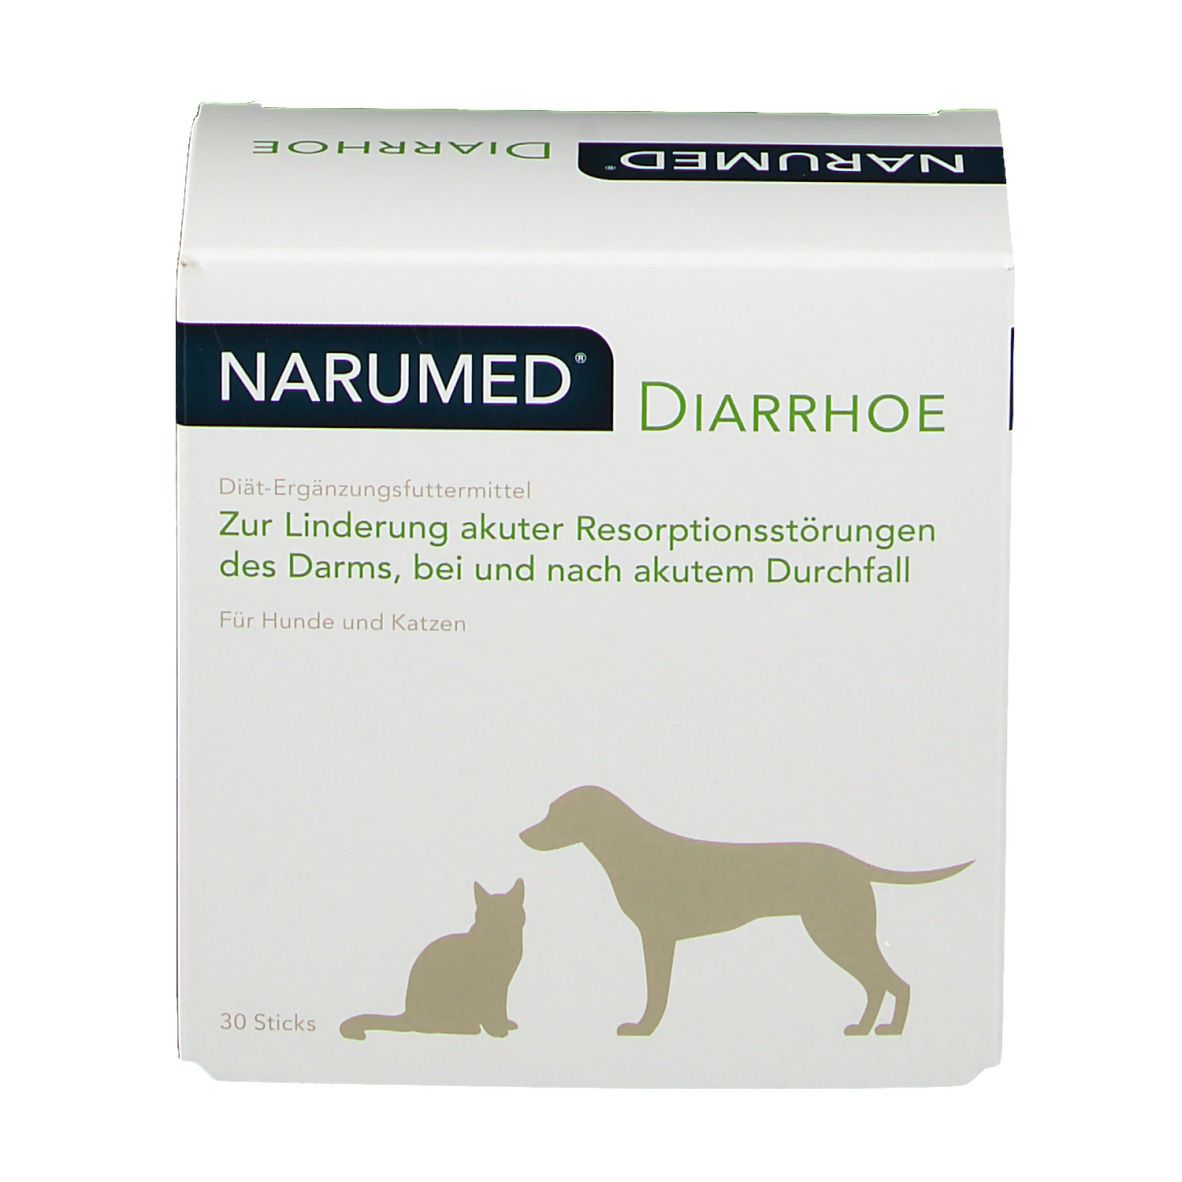 NARUMED® Diarrhoe